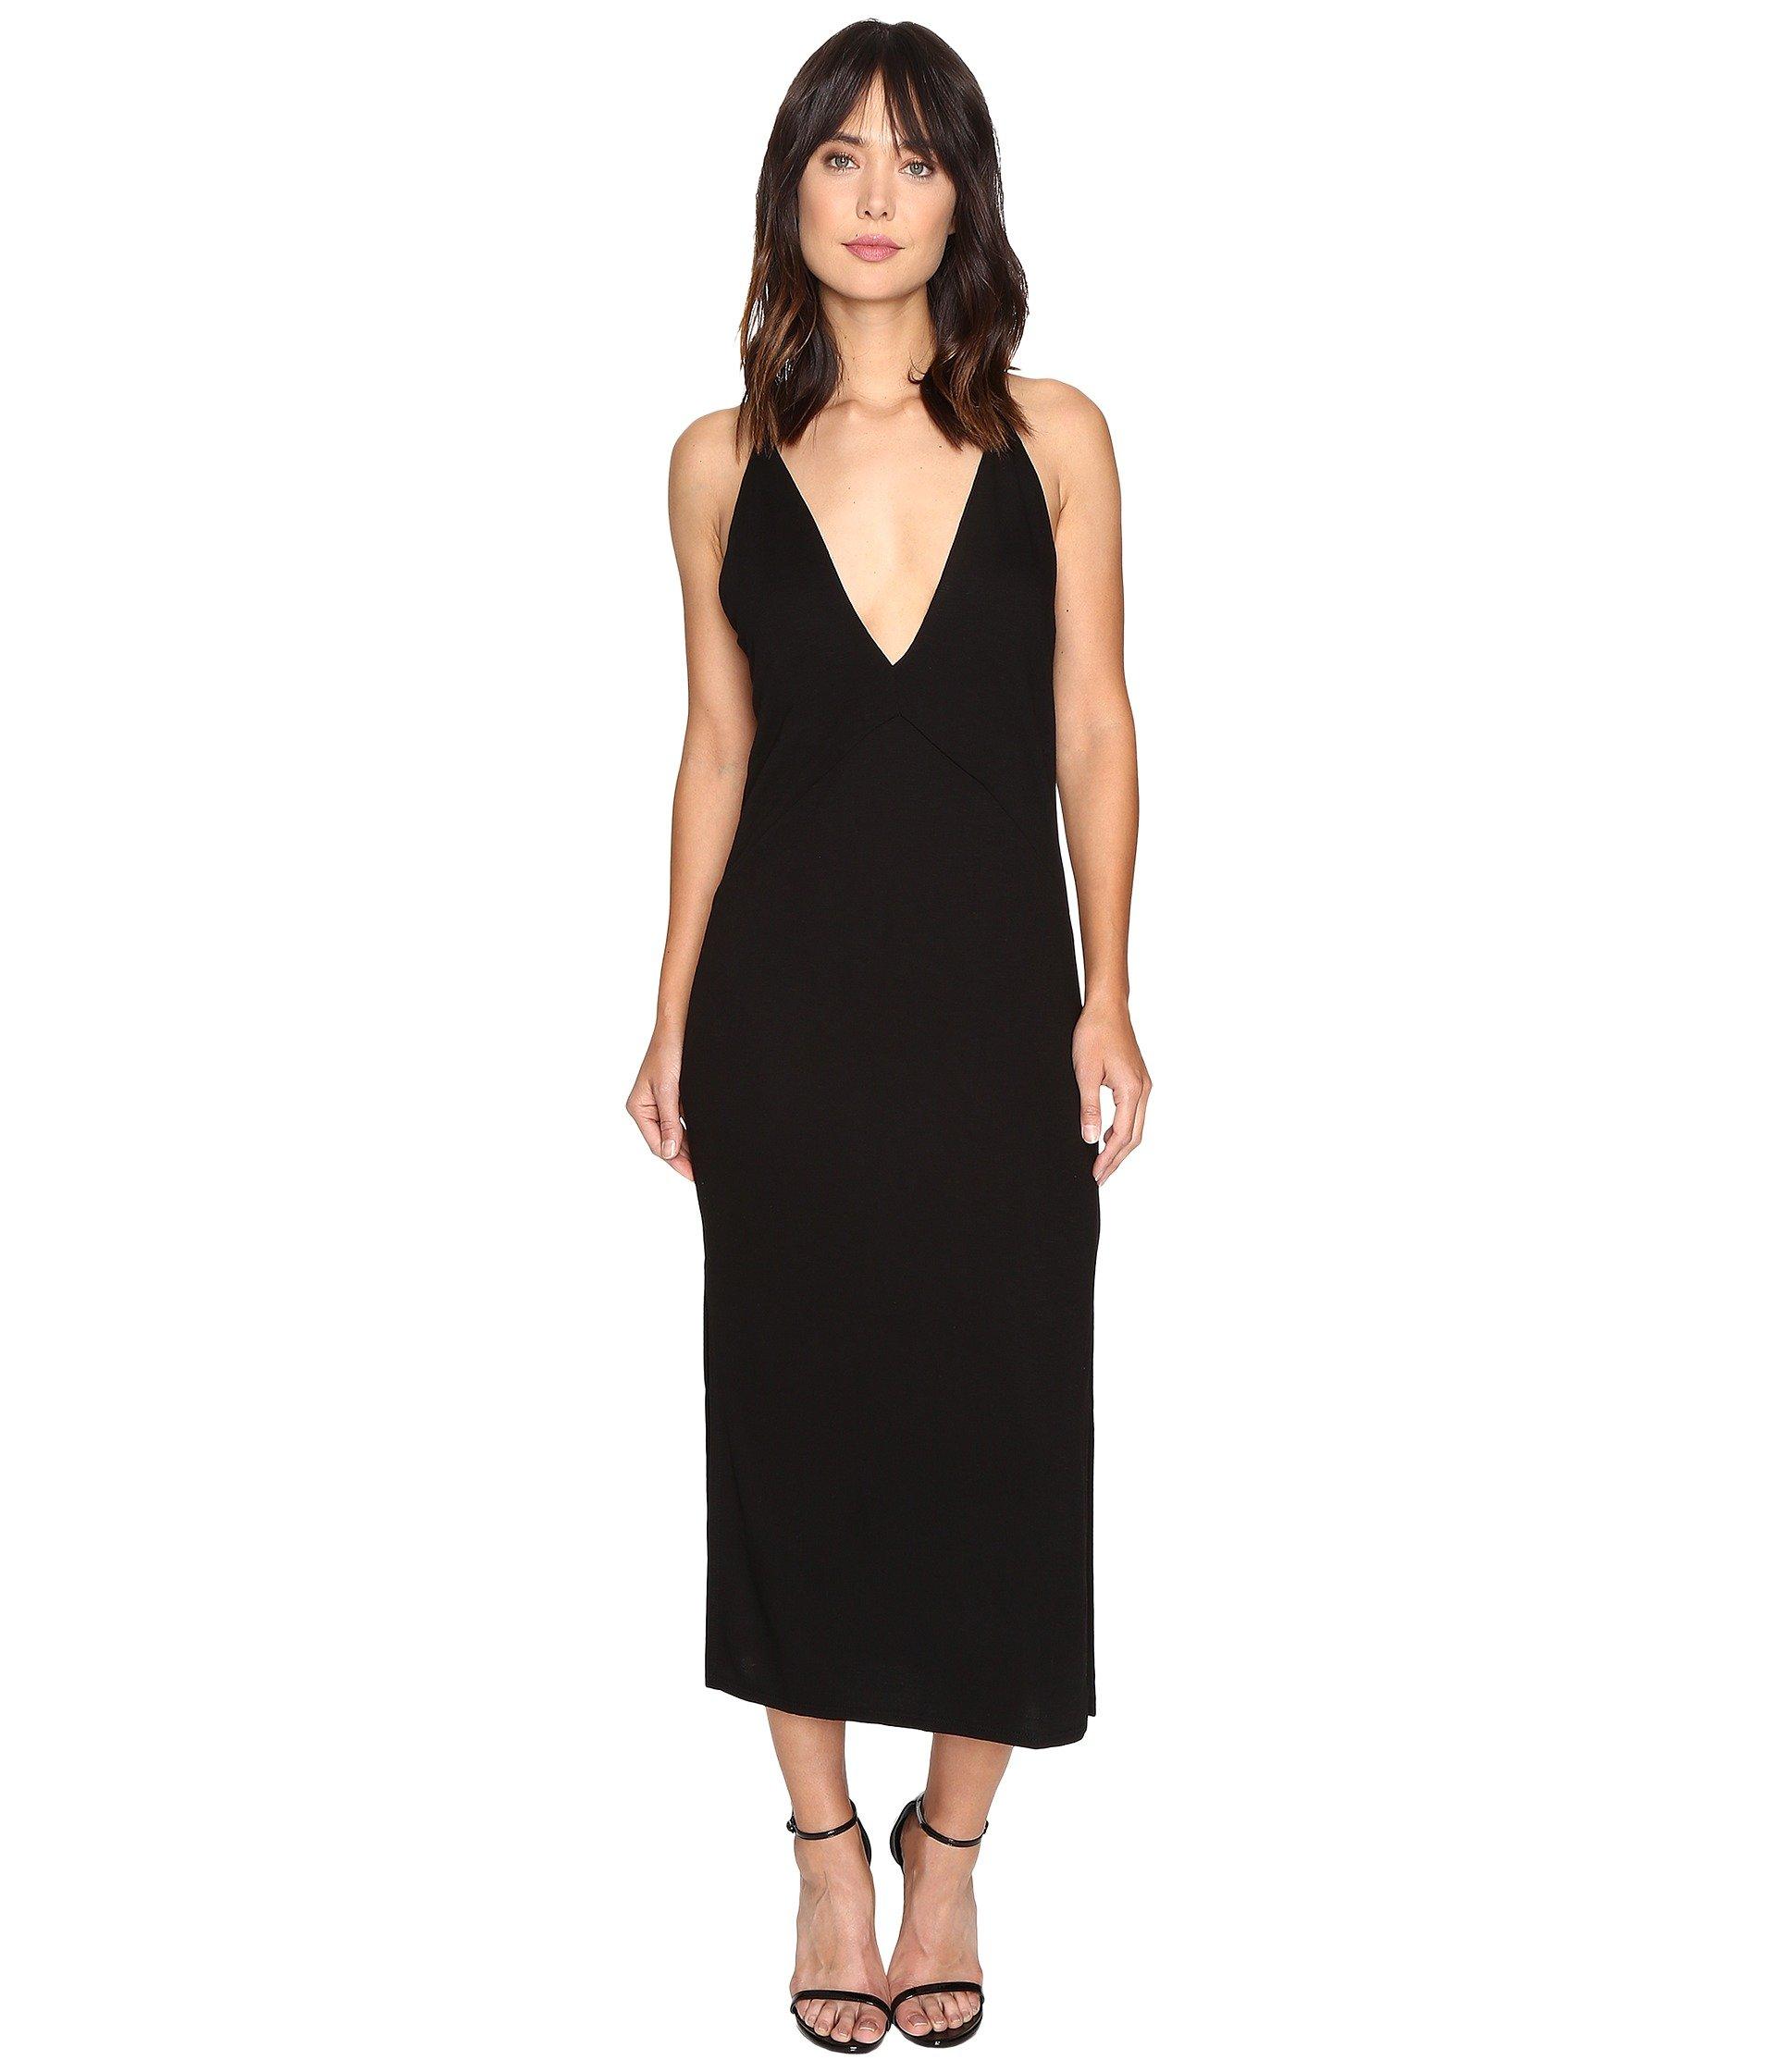 Lanston Slit Cami Midi Dress